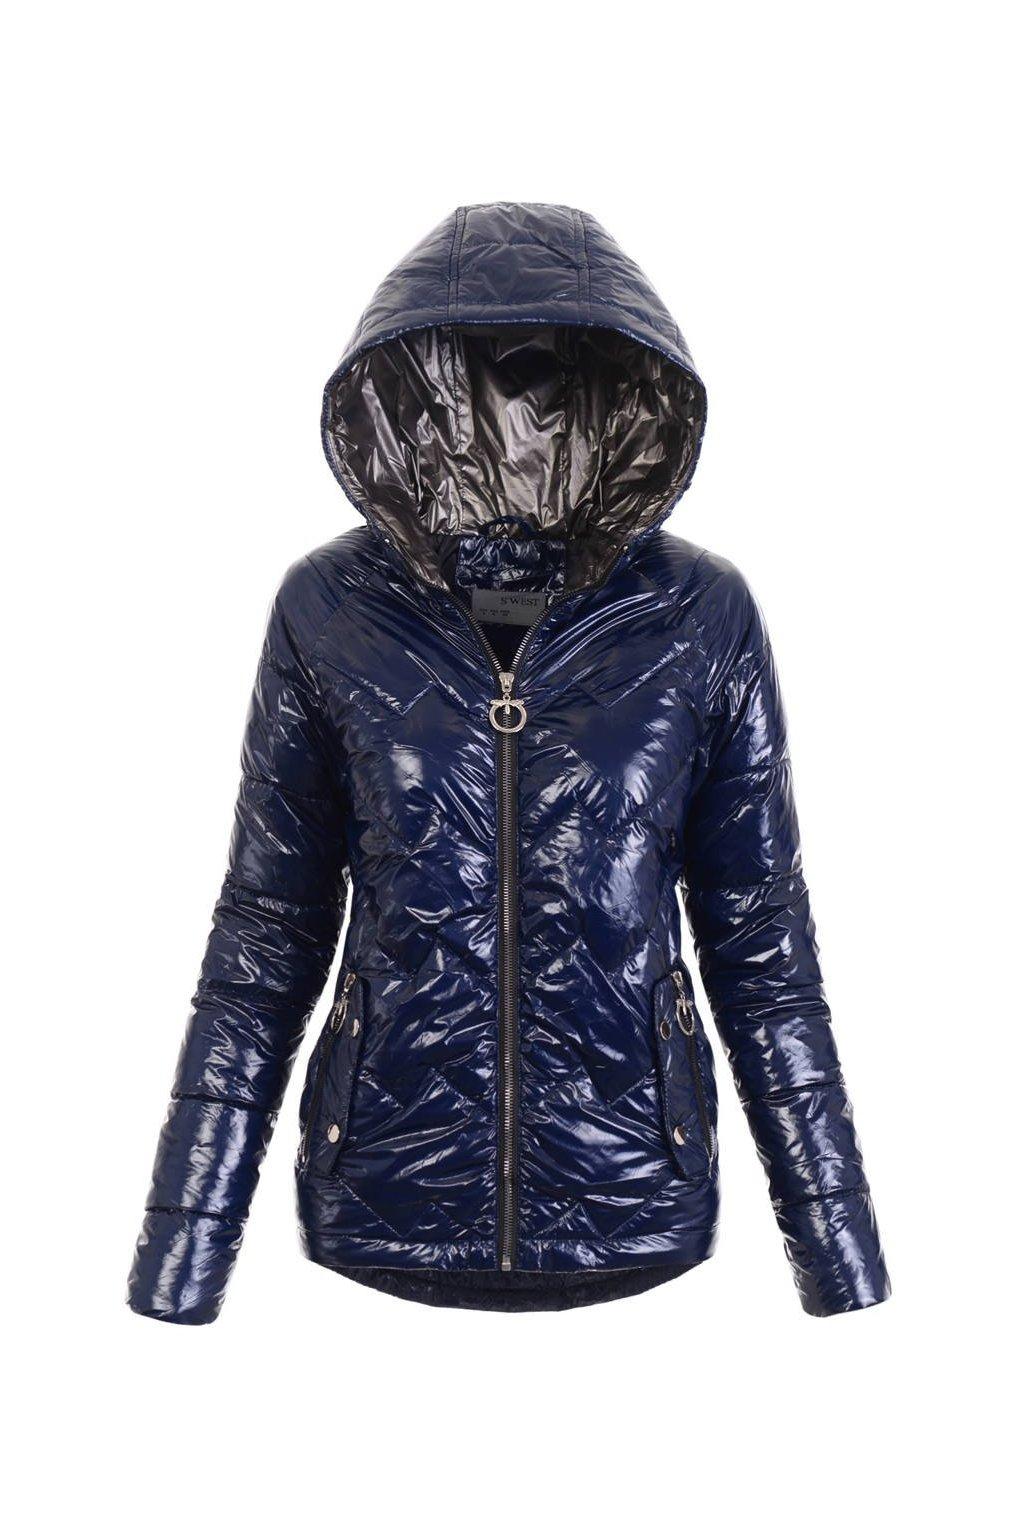 Dámska prechodná bunda s kapucňou 4885 modrá